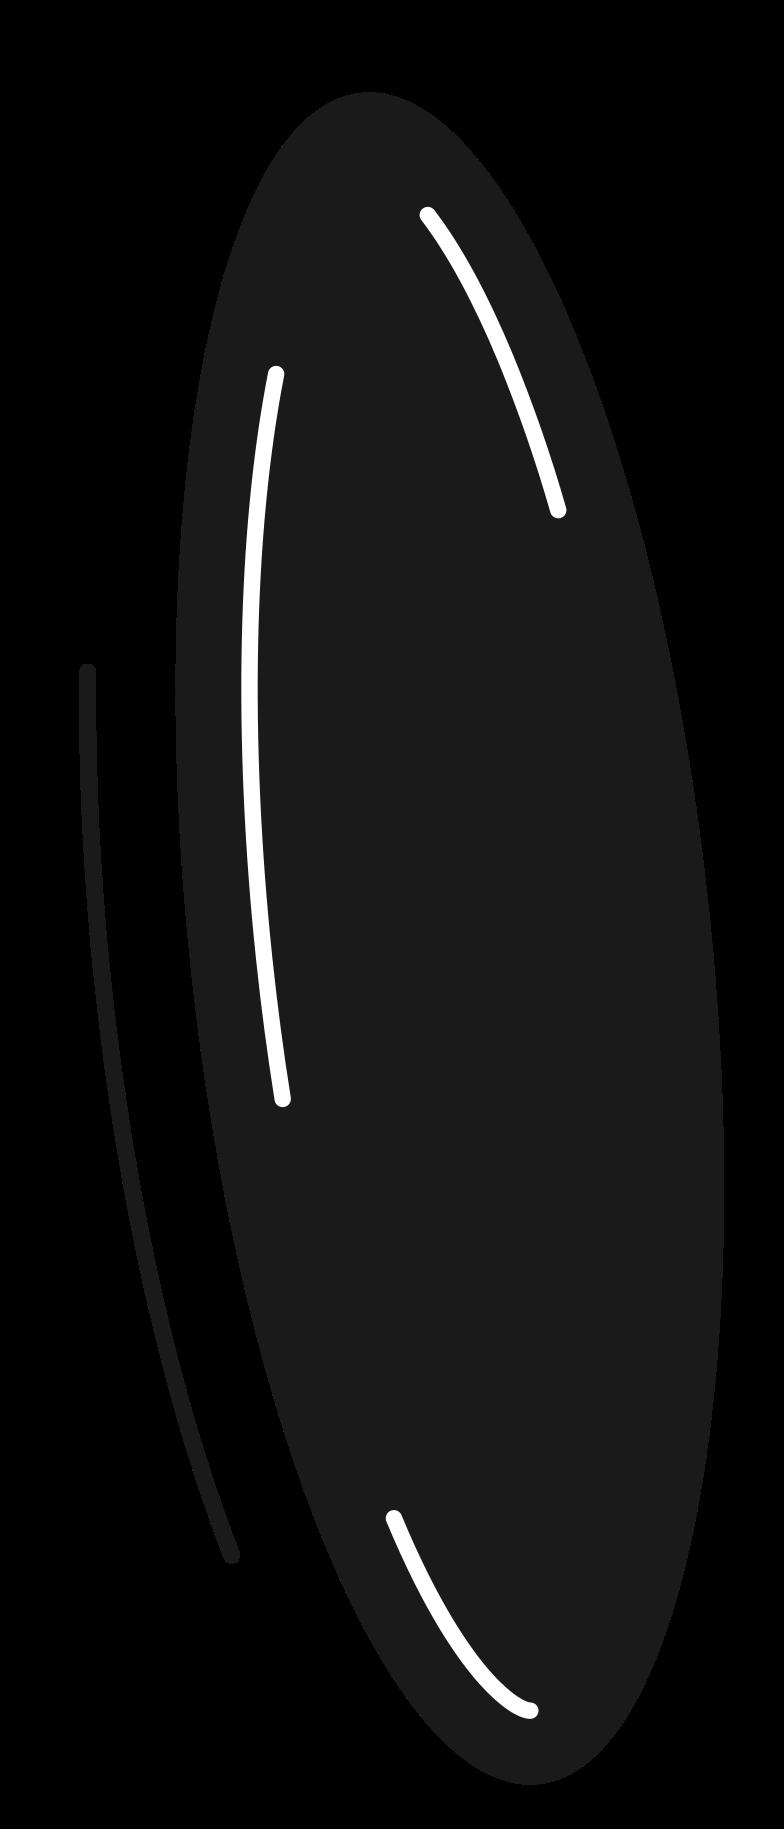 Teleportieren Clipart-Grafik als PNG, SVG